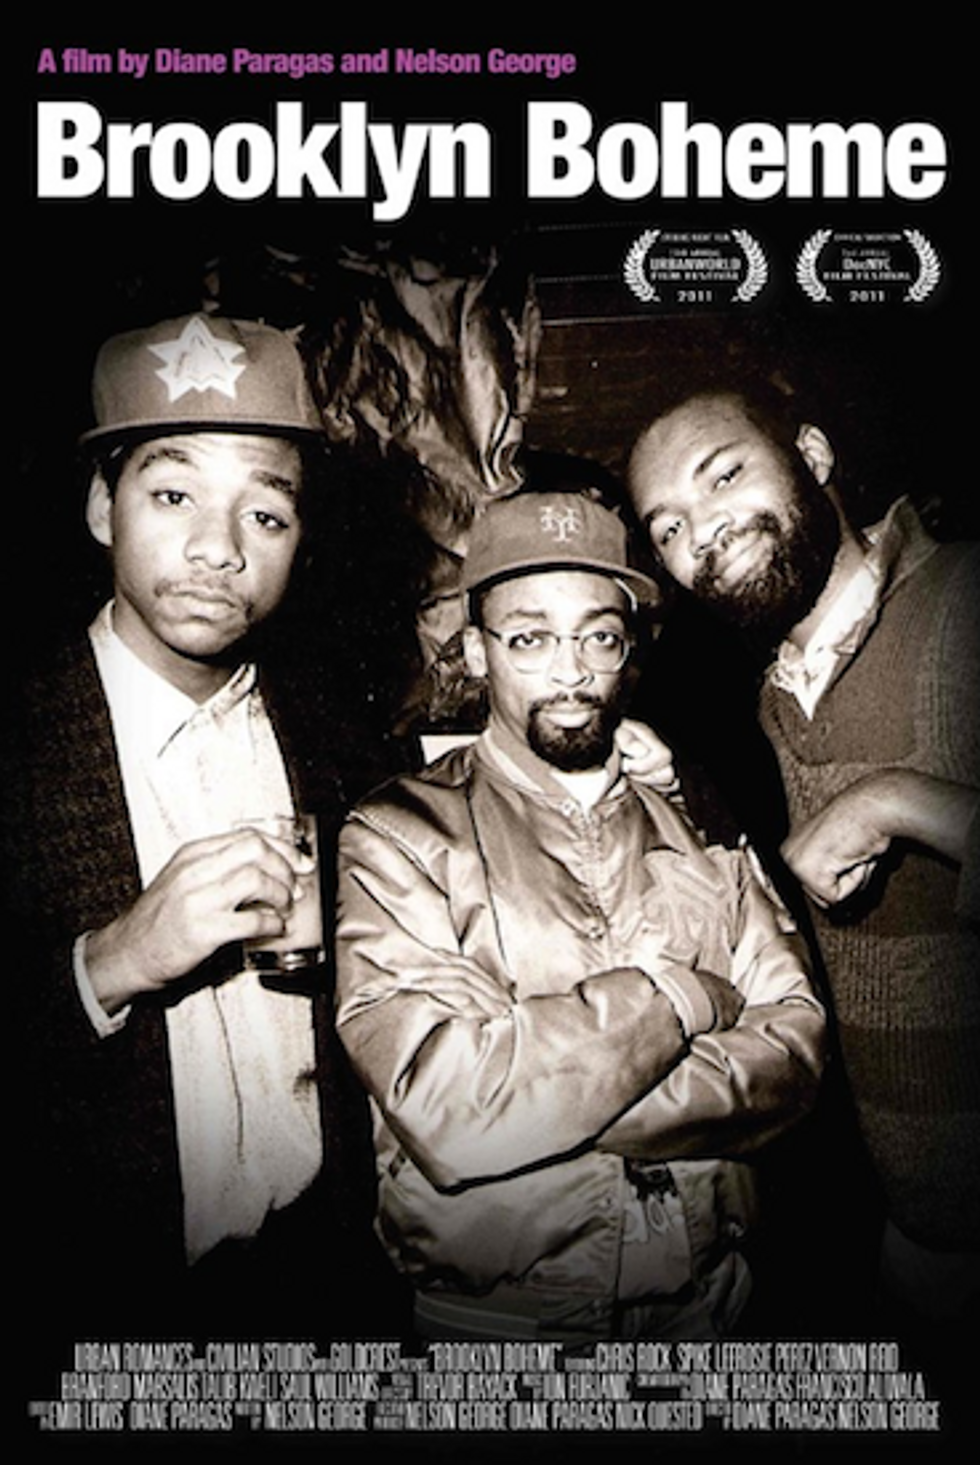 Brooklyn Boheme Documentary Comes to BAM